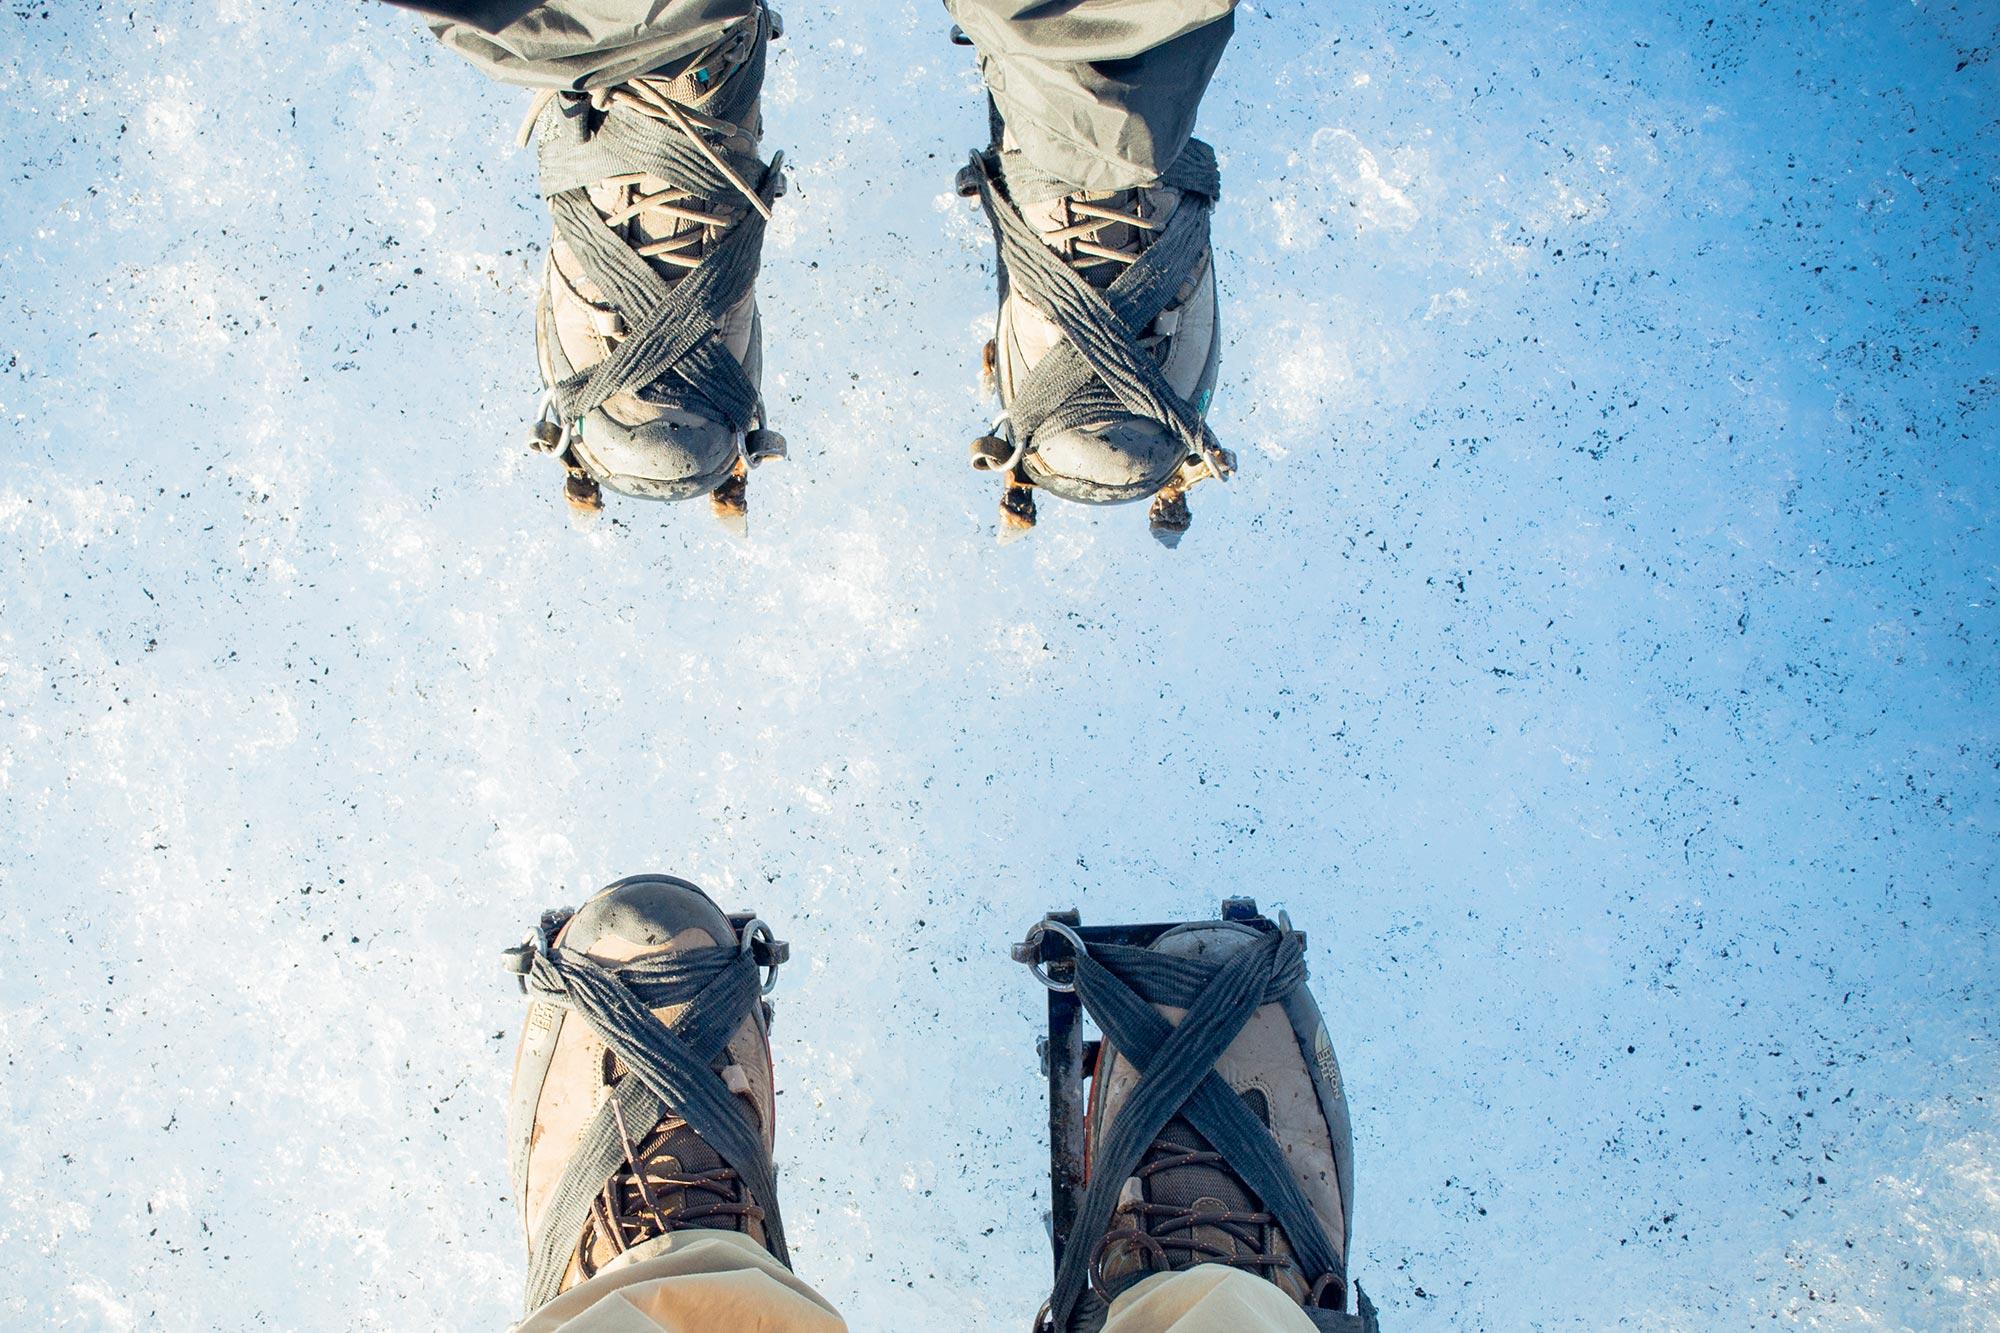 Argentina patagonia Calafate Perito Moreno trekking ice rampons